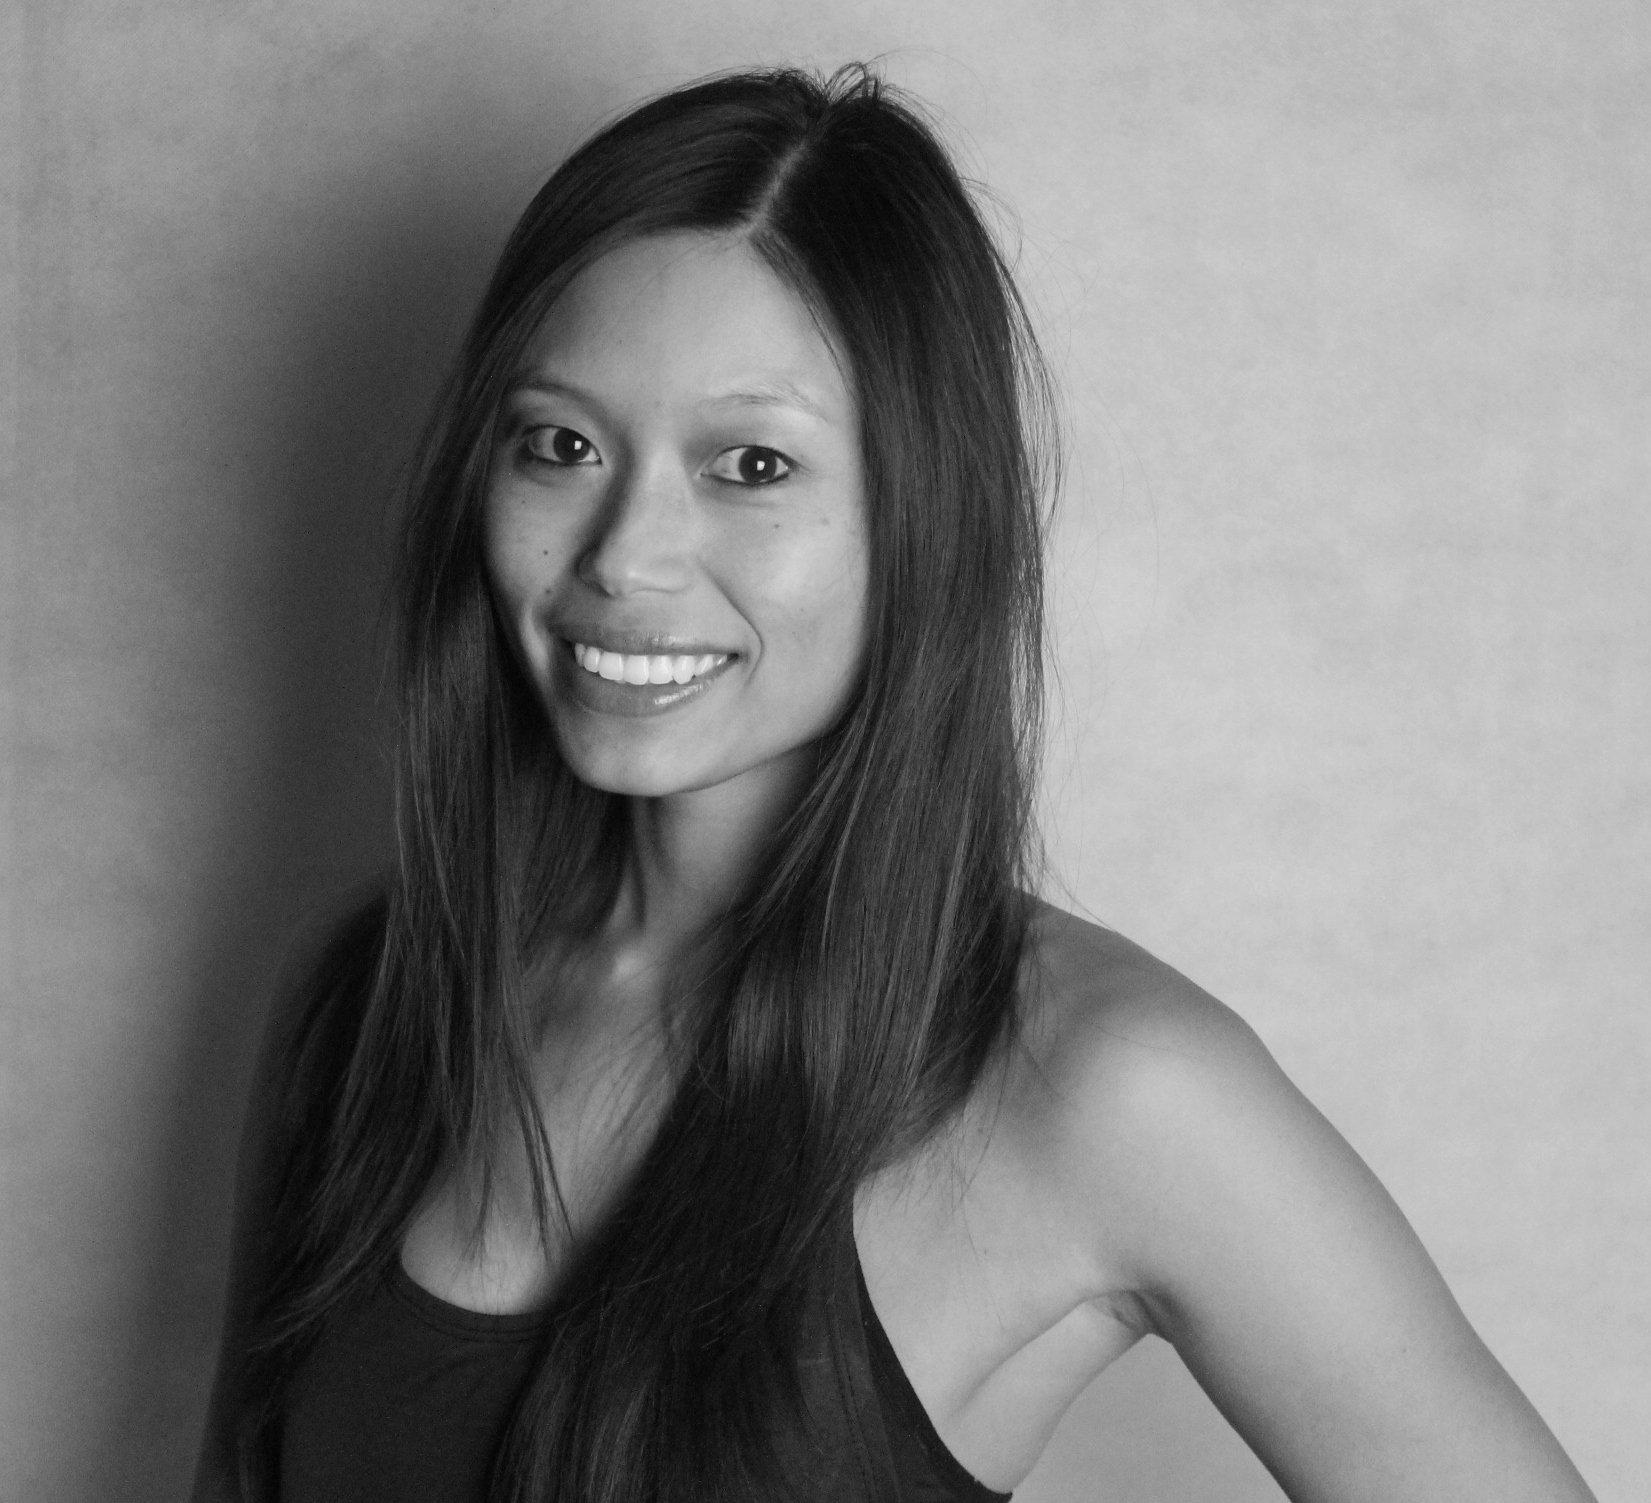 Rachel-Huxtable-Team-Member-At-Kaya-Health-Clubs